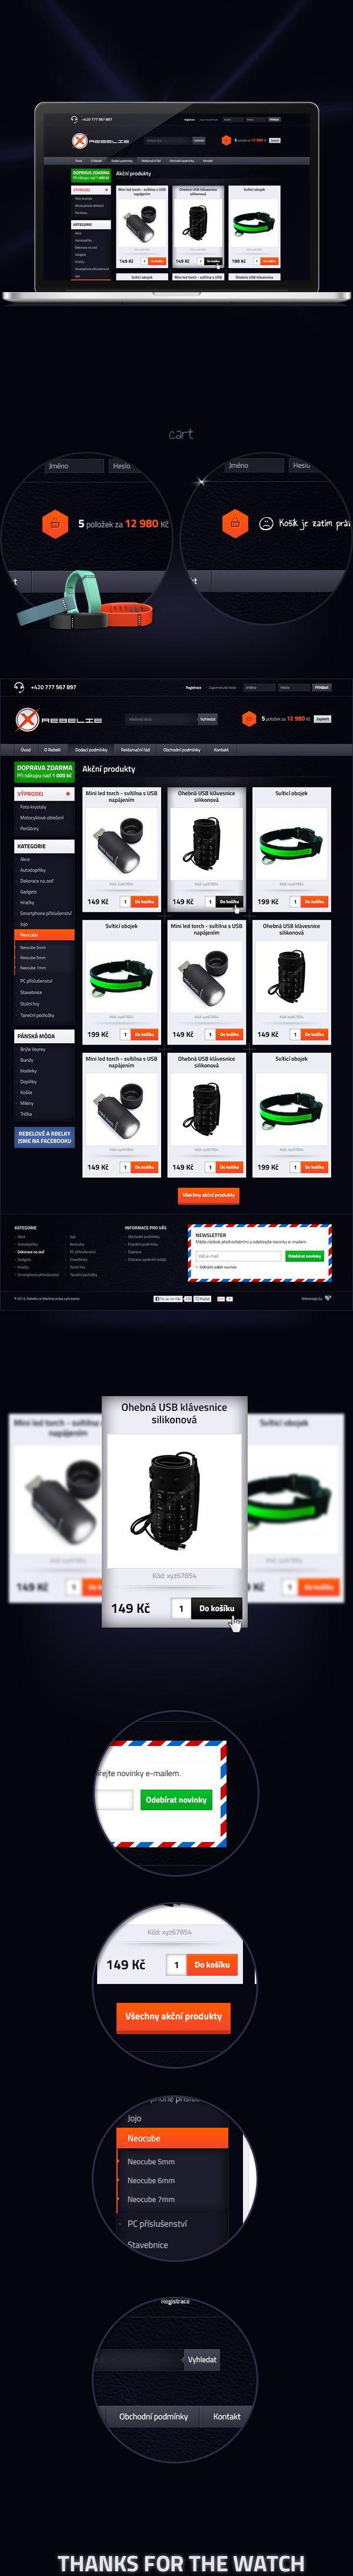 Rebelie.cz -Homepage by Visualcreative.cz , via Behance